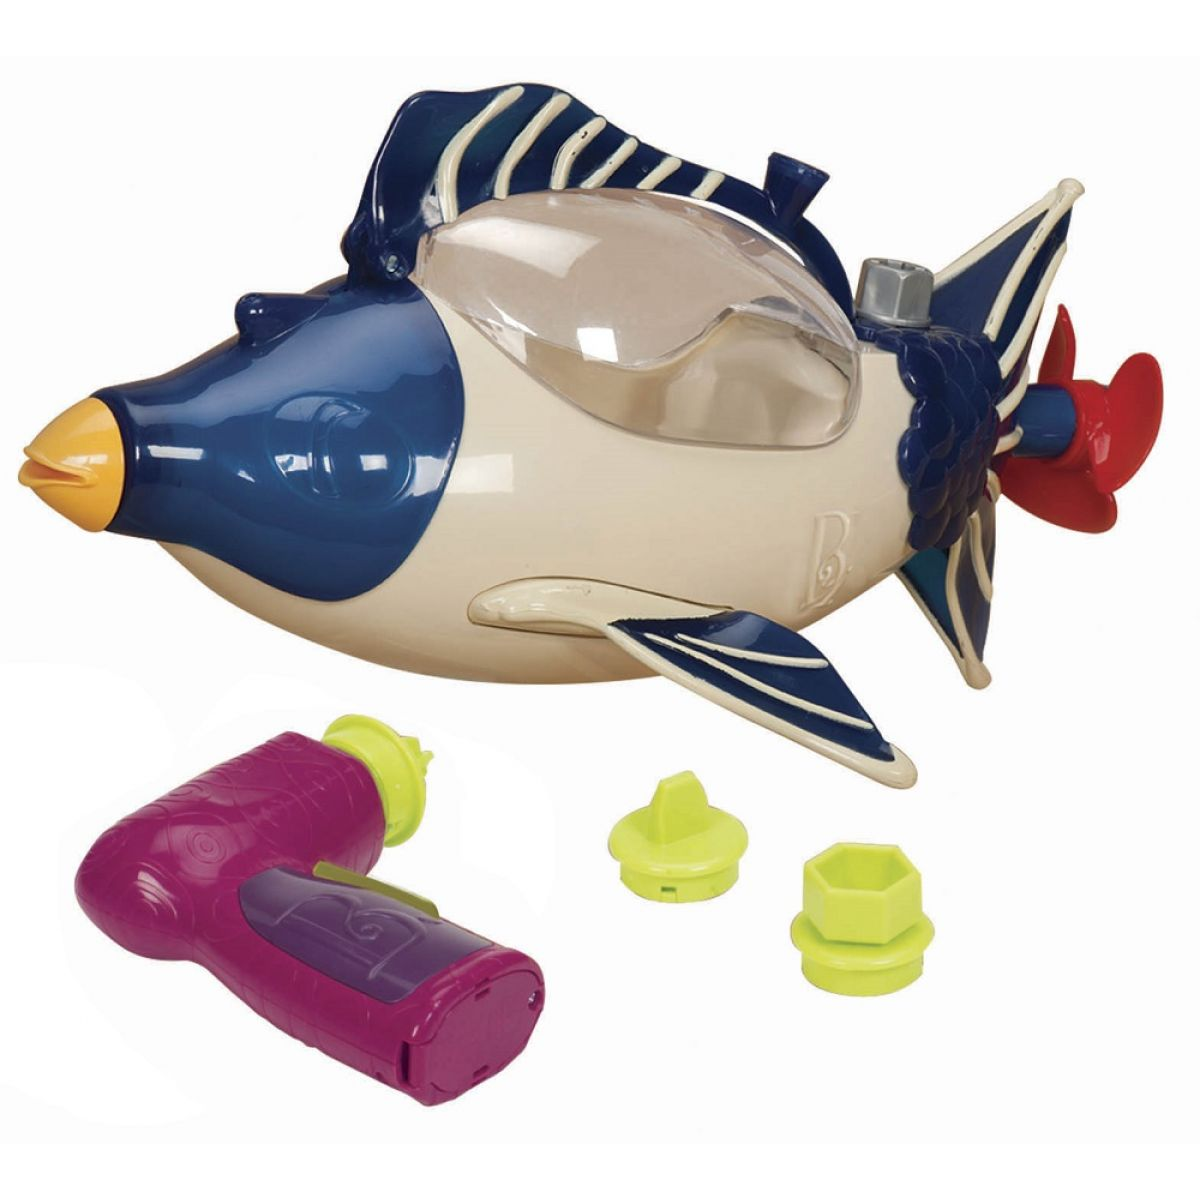 B-TOYS ponorka